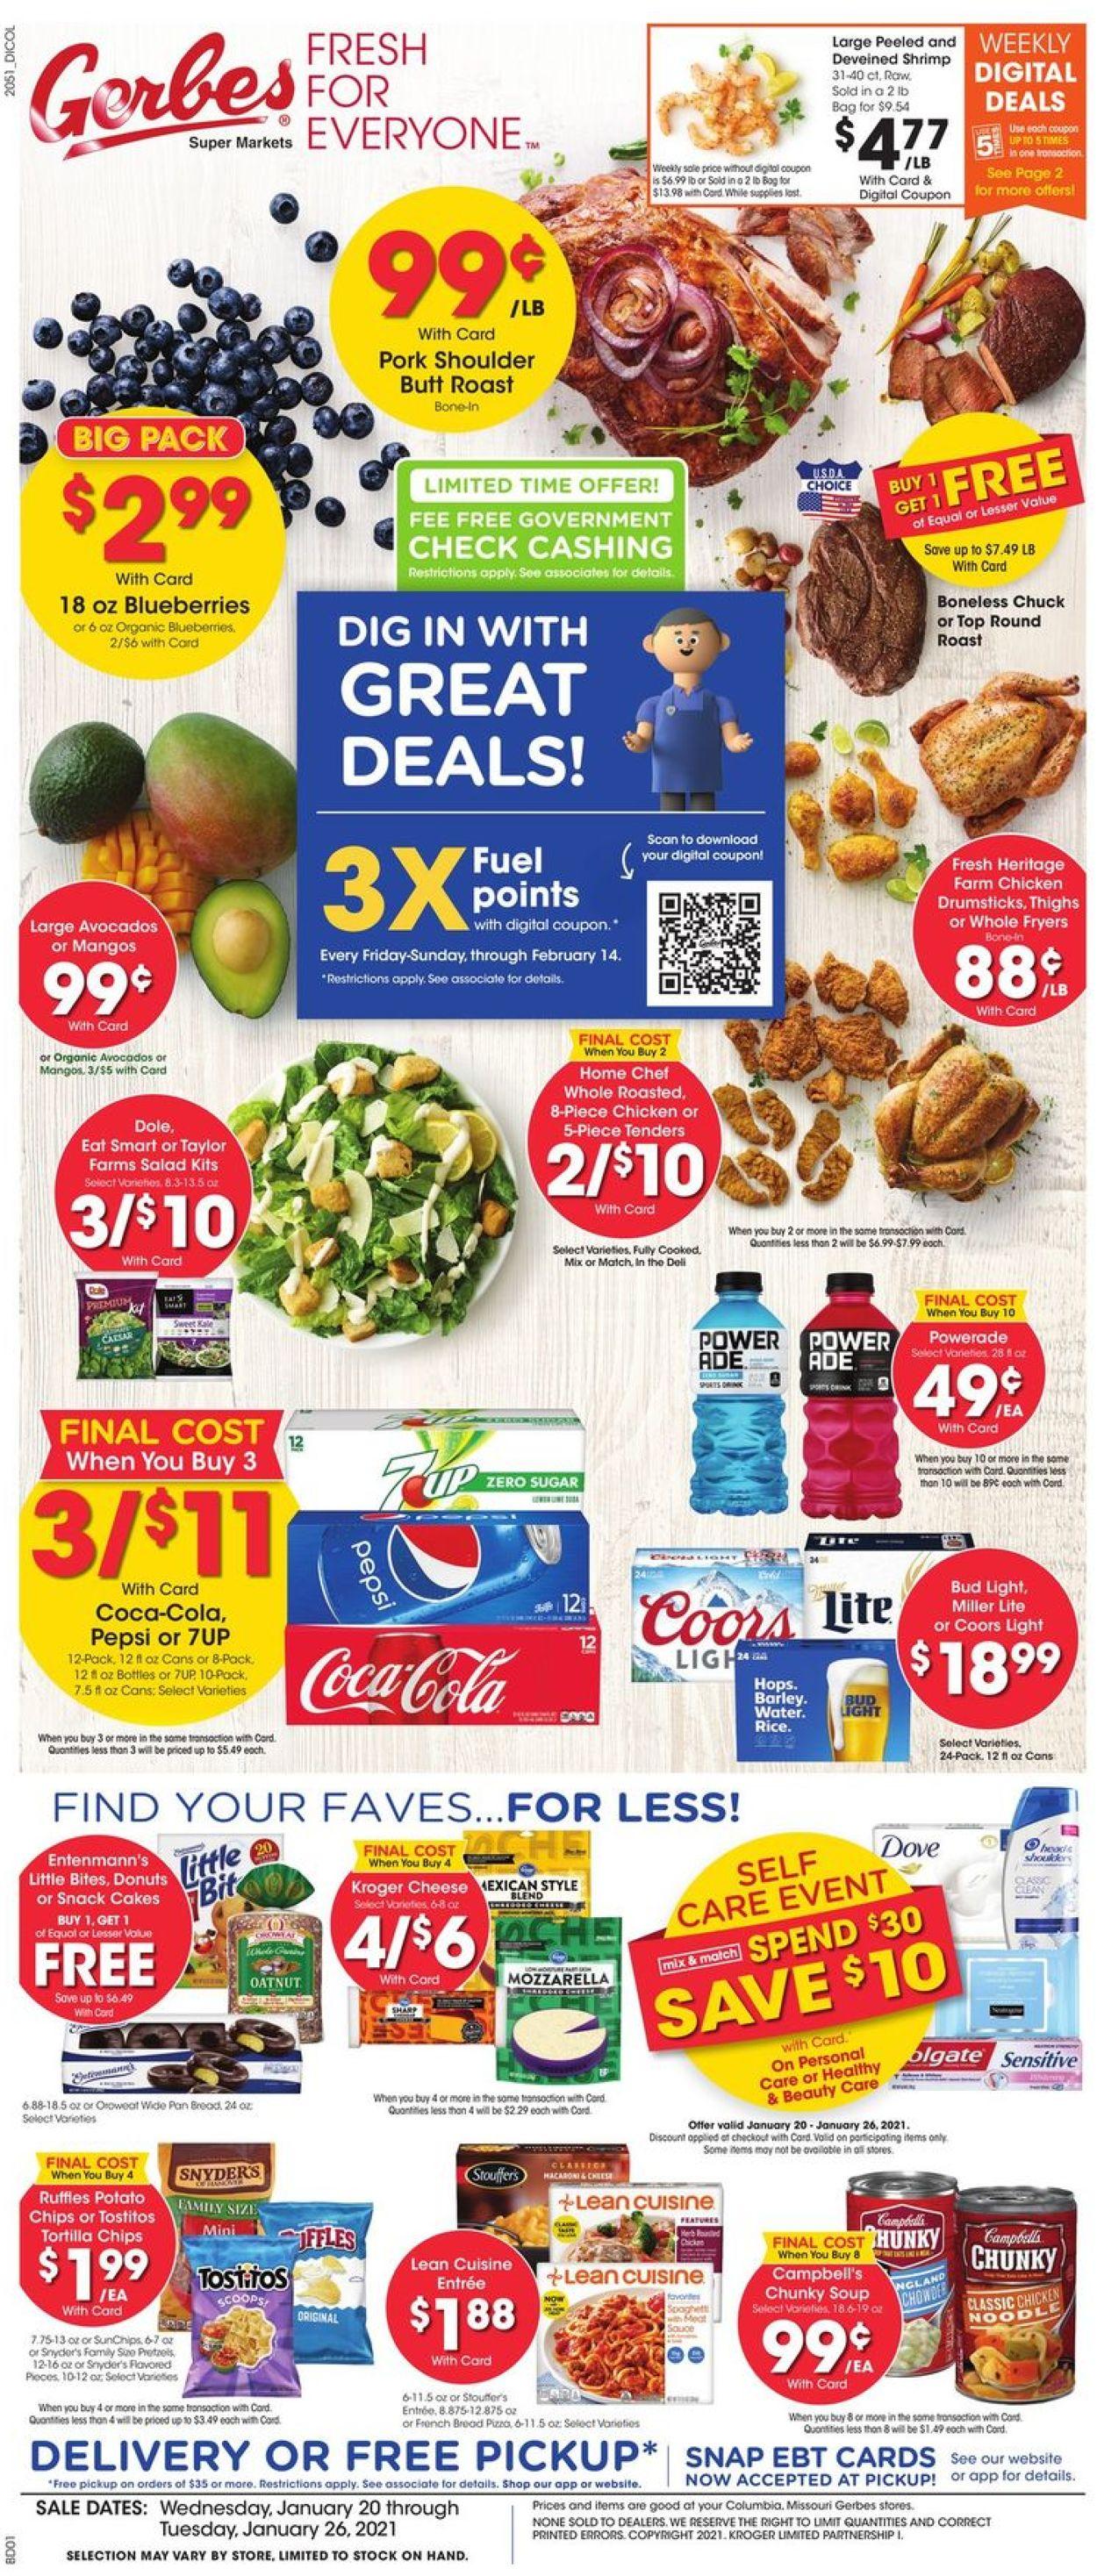 Gerbes Super Markets Weekly Ad Circular - valid 01/20-01/26/2021